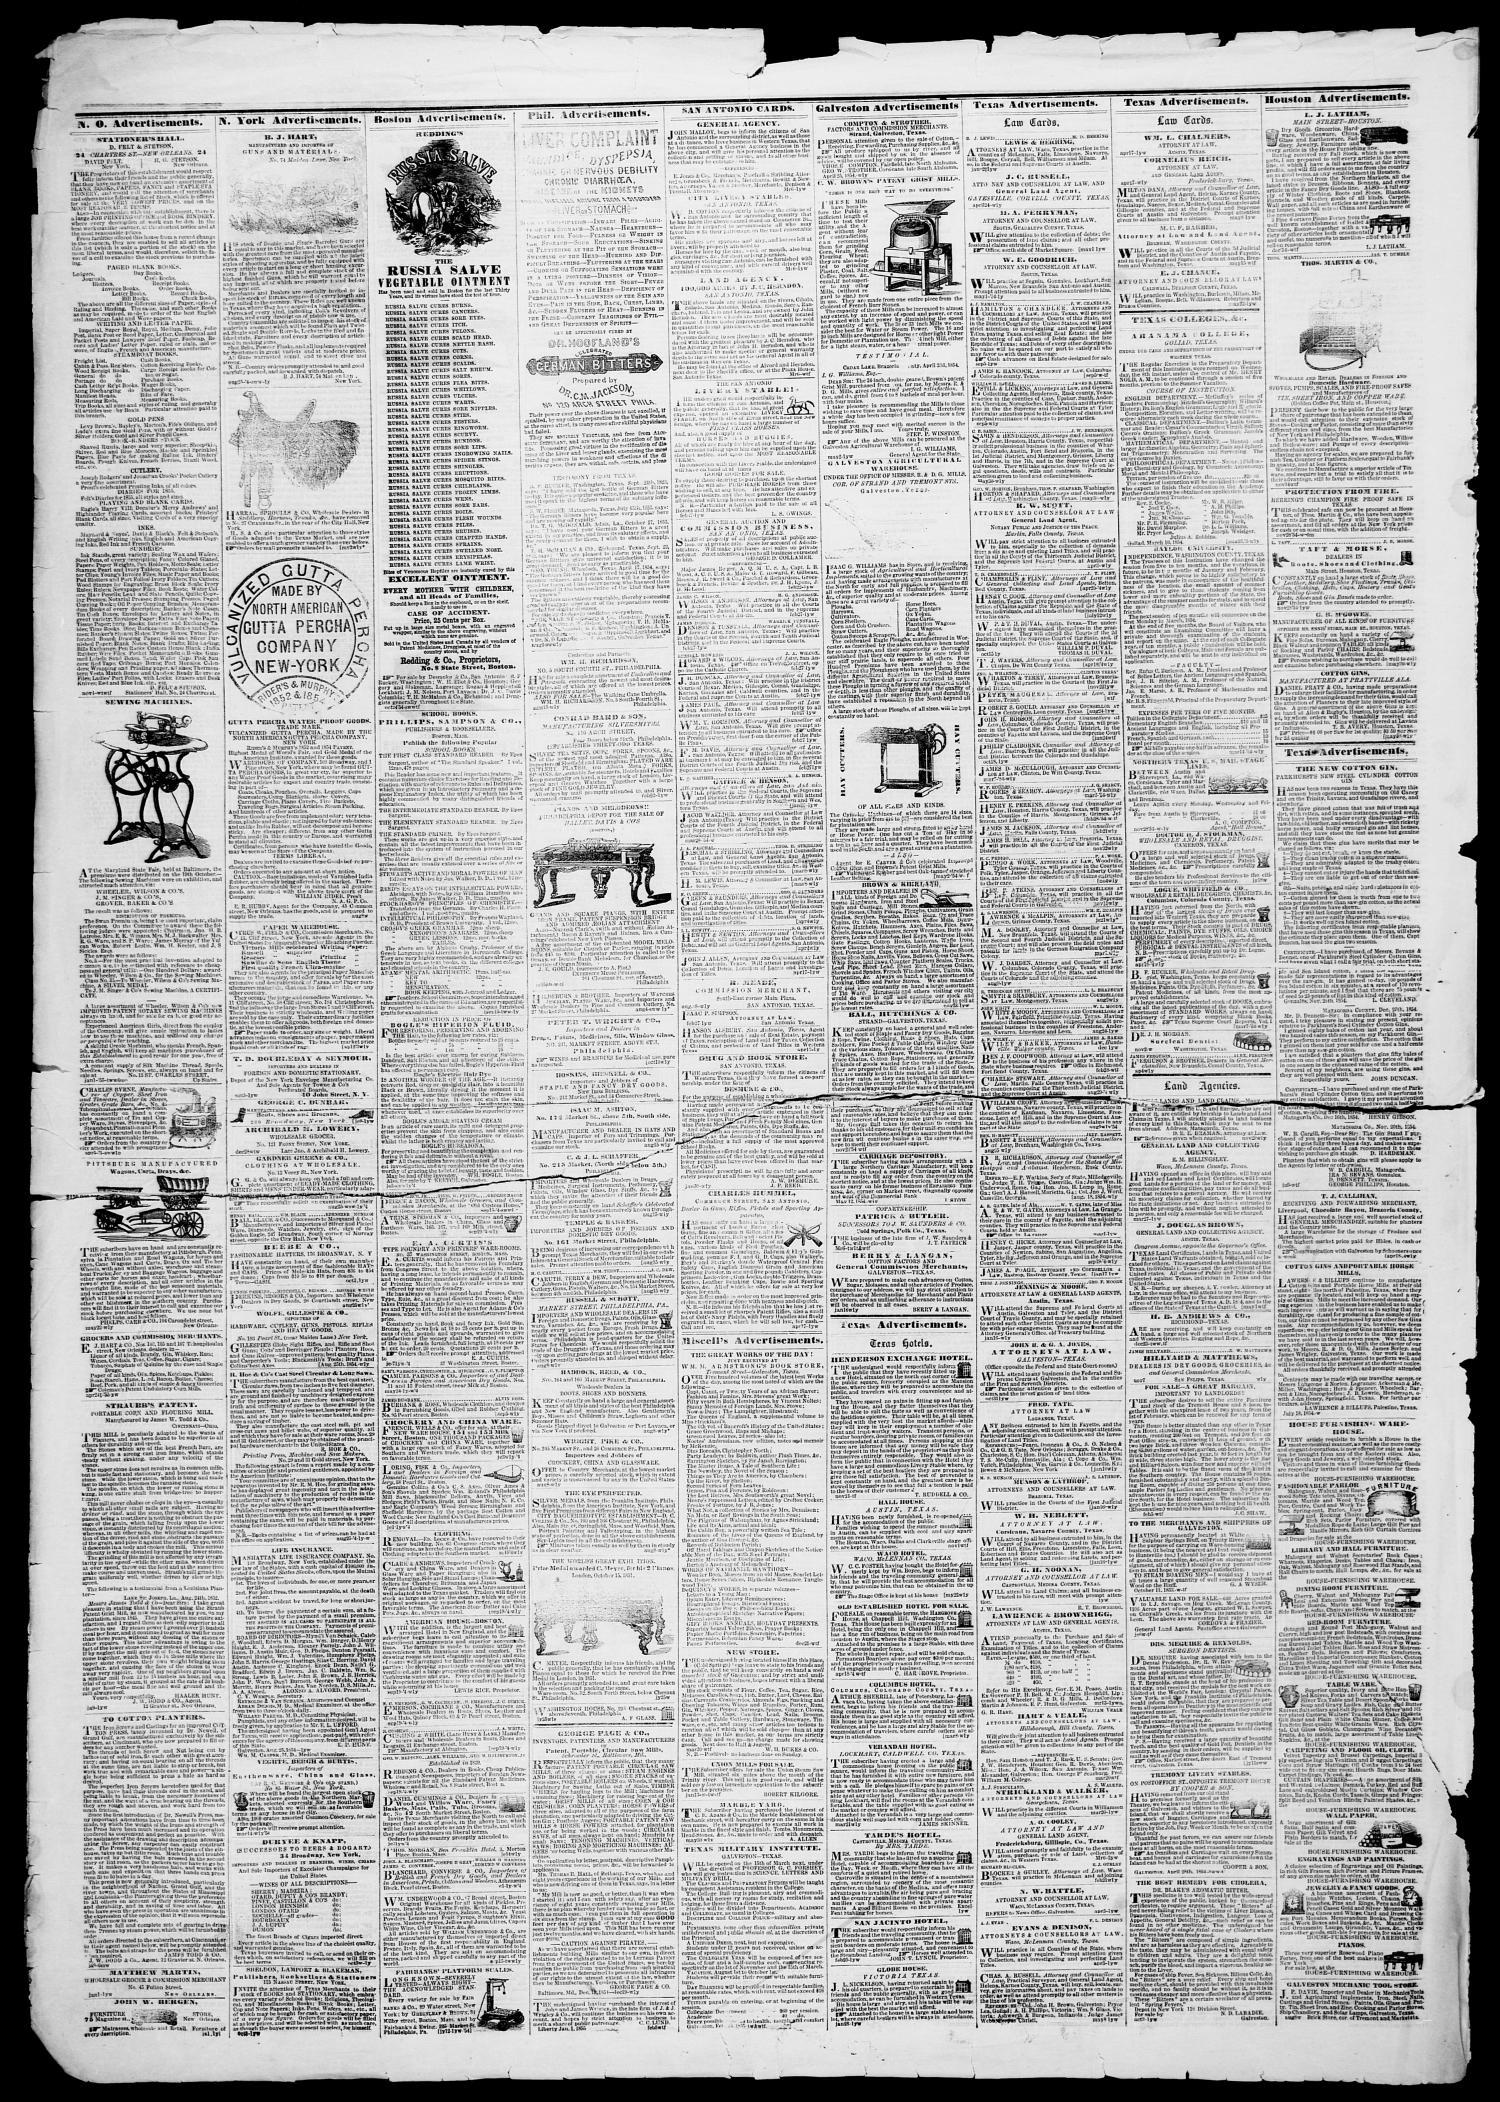 Galveston Weekly News (Galveston, Tex ), Vol  12, No  14, Ed